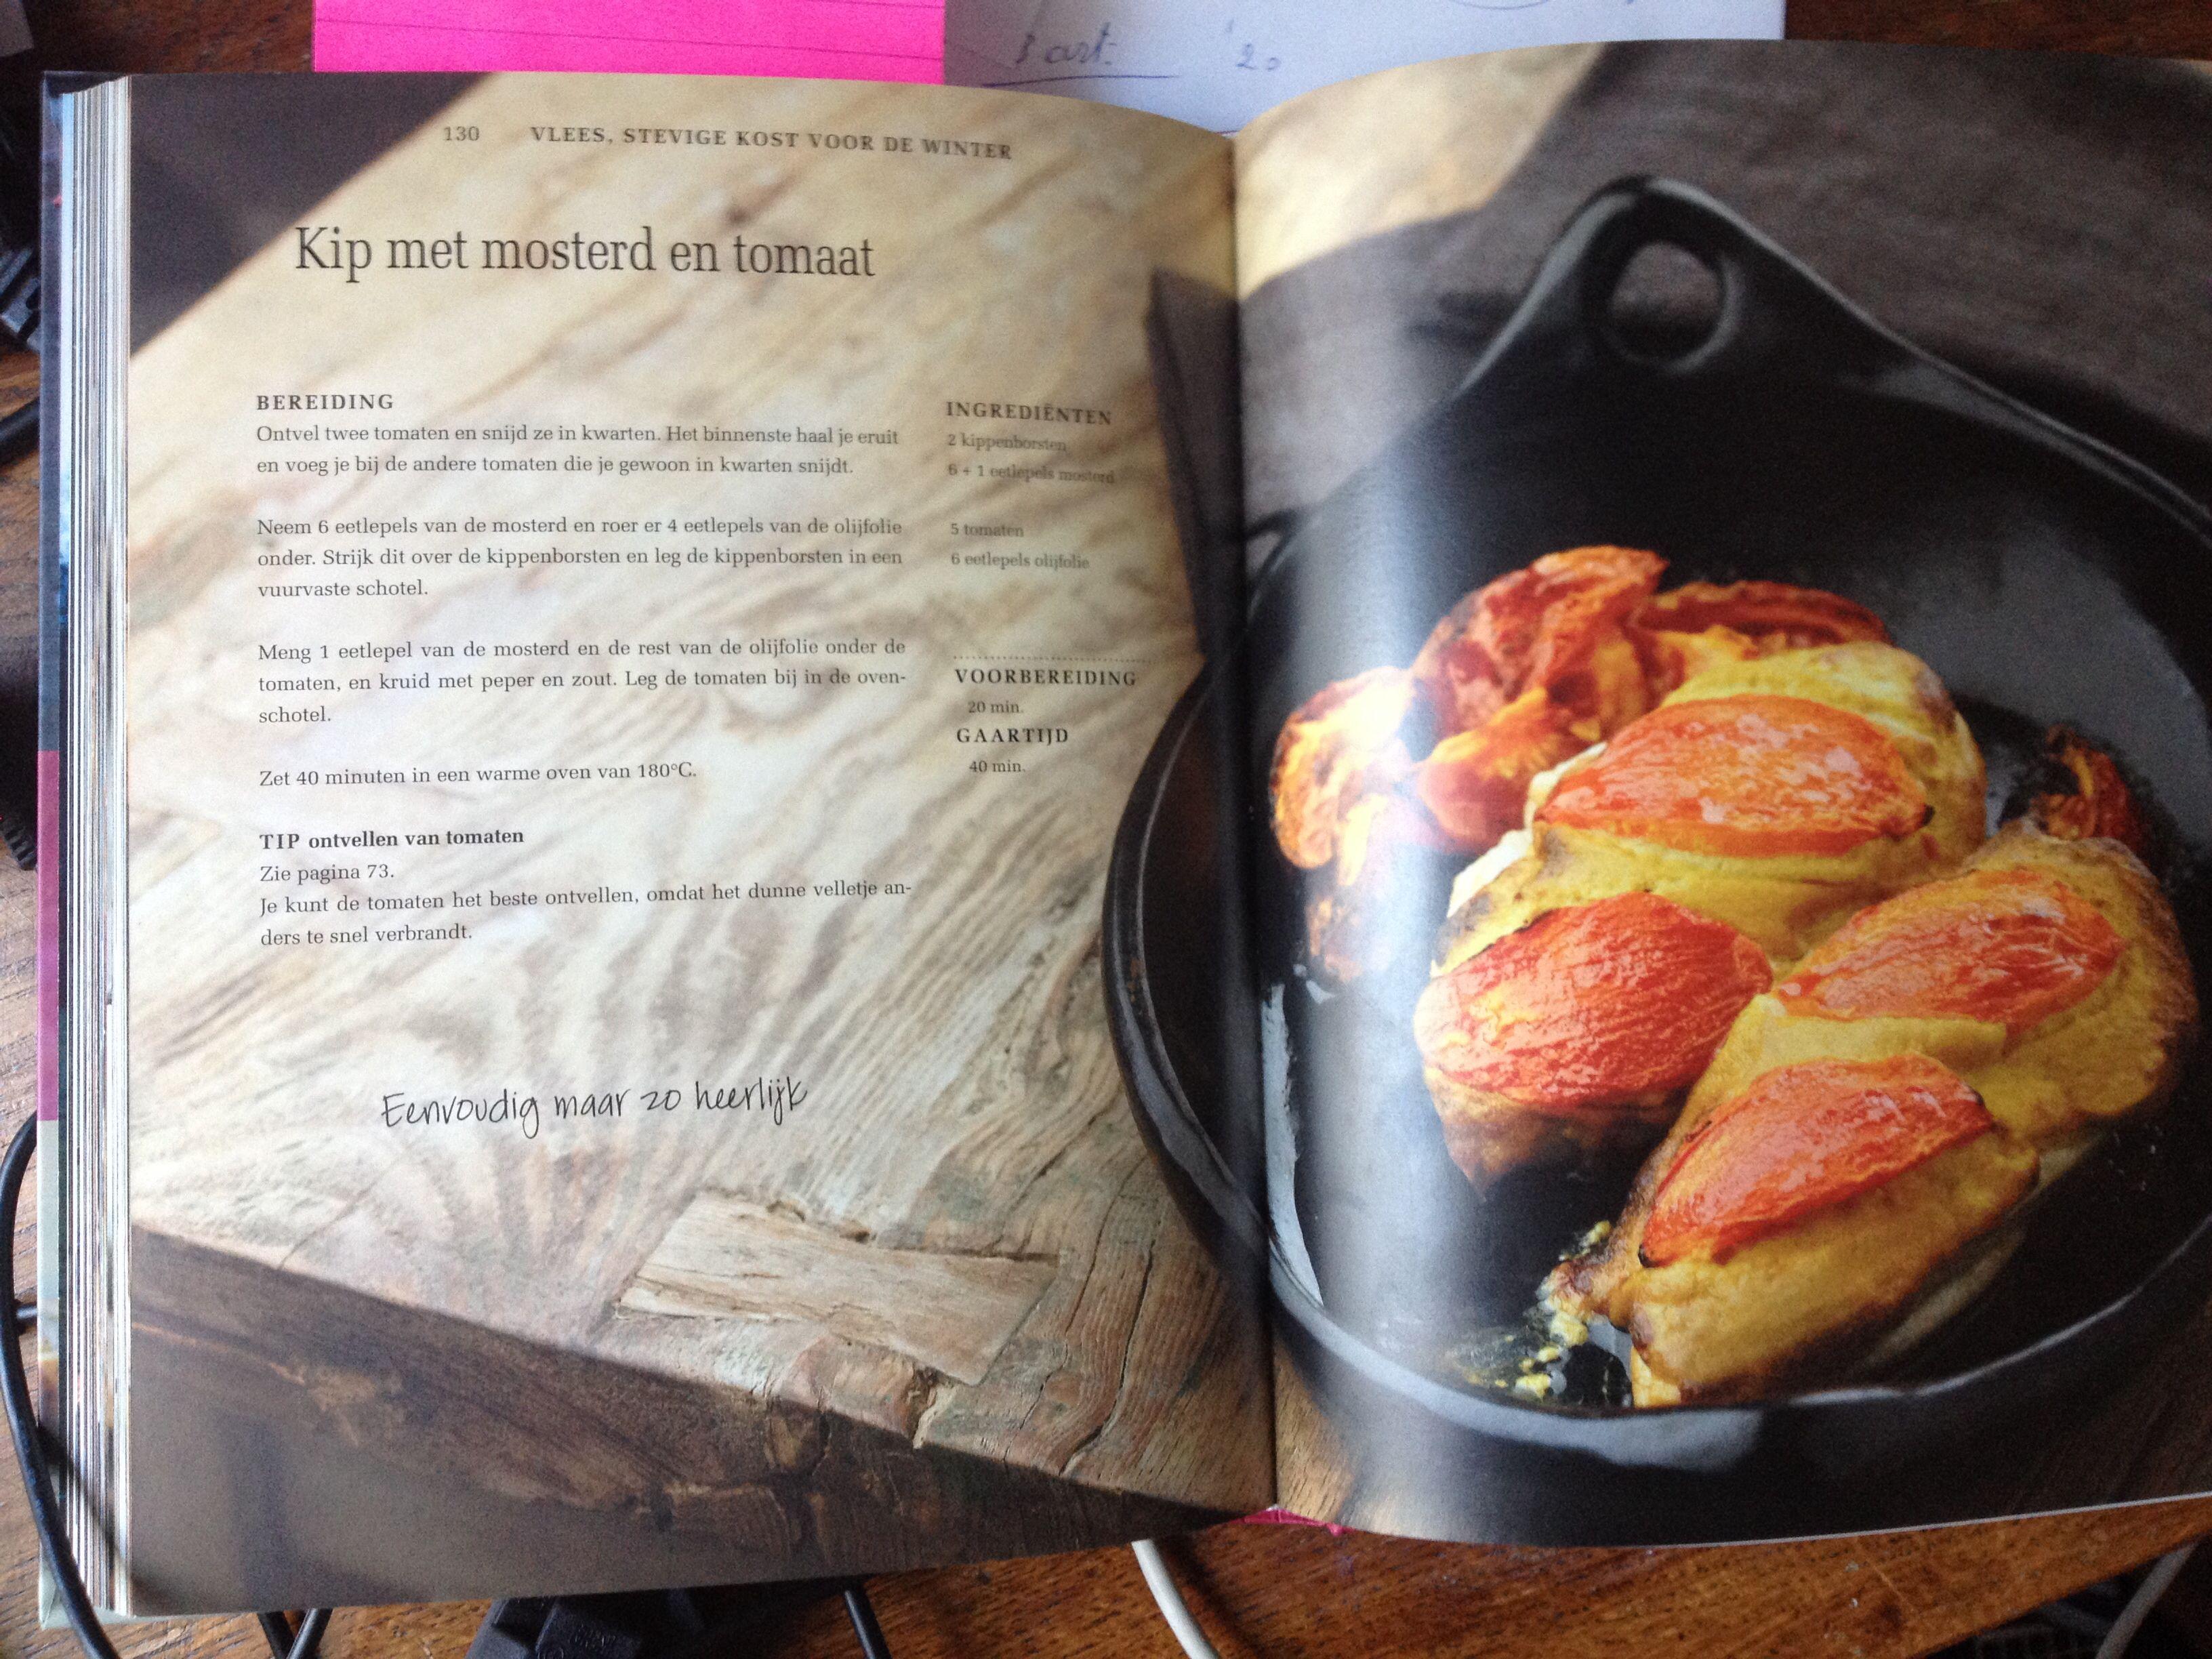 Mijn Pure Keuken : Kip tomaat mosterd pascale naessens mijn pure keuken 2 p. 130